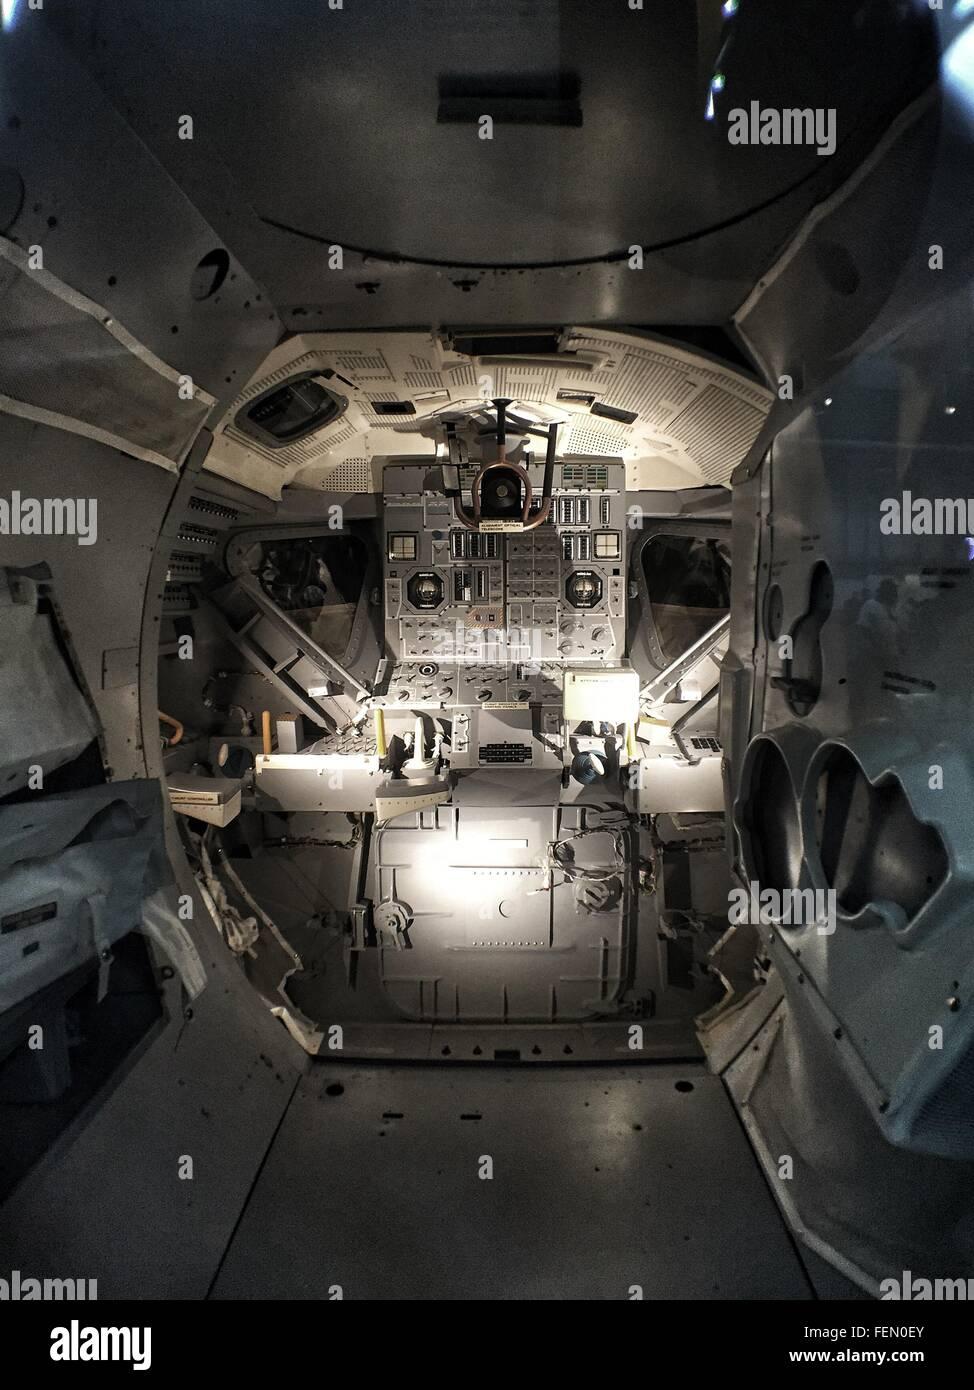 space shuttle interior 3d scan - photo #12